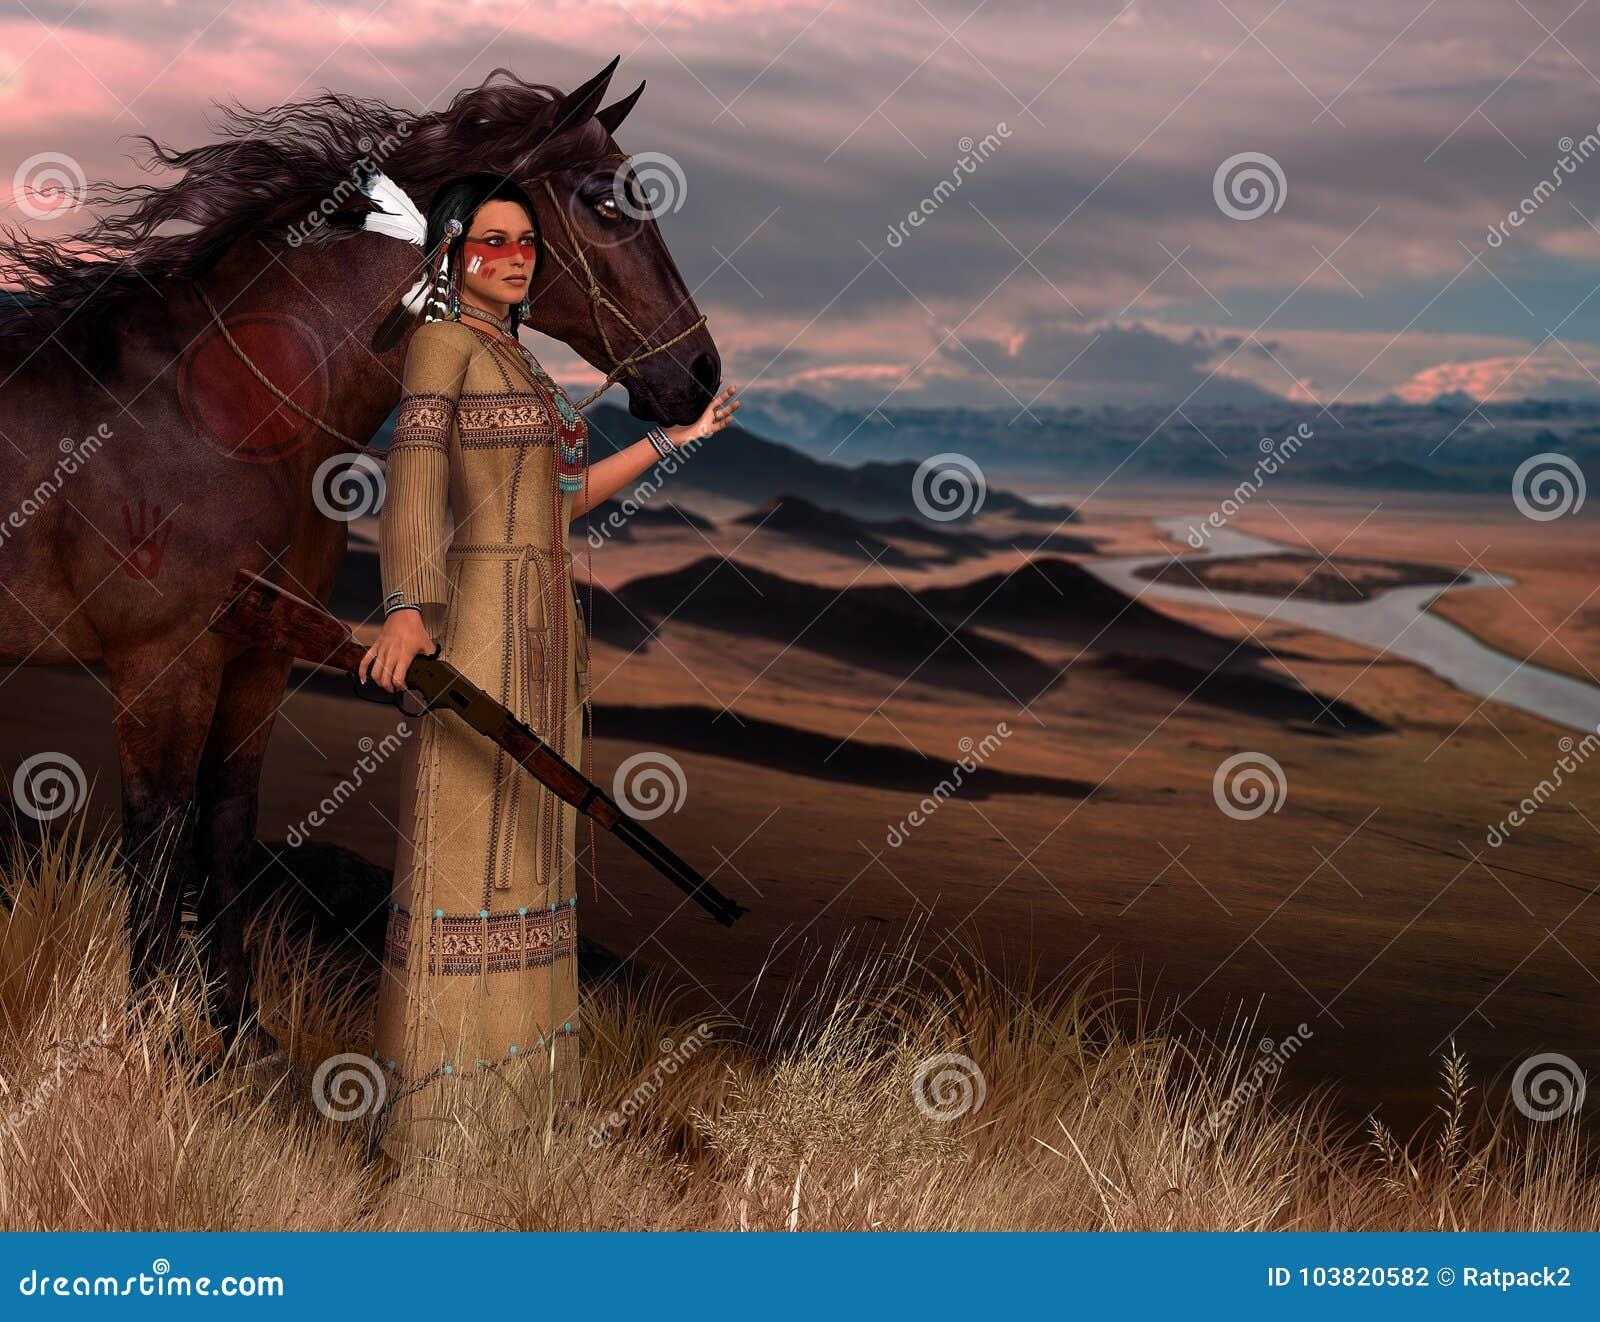 Cheyenne American Indian Woman Illustration